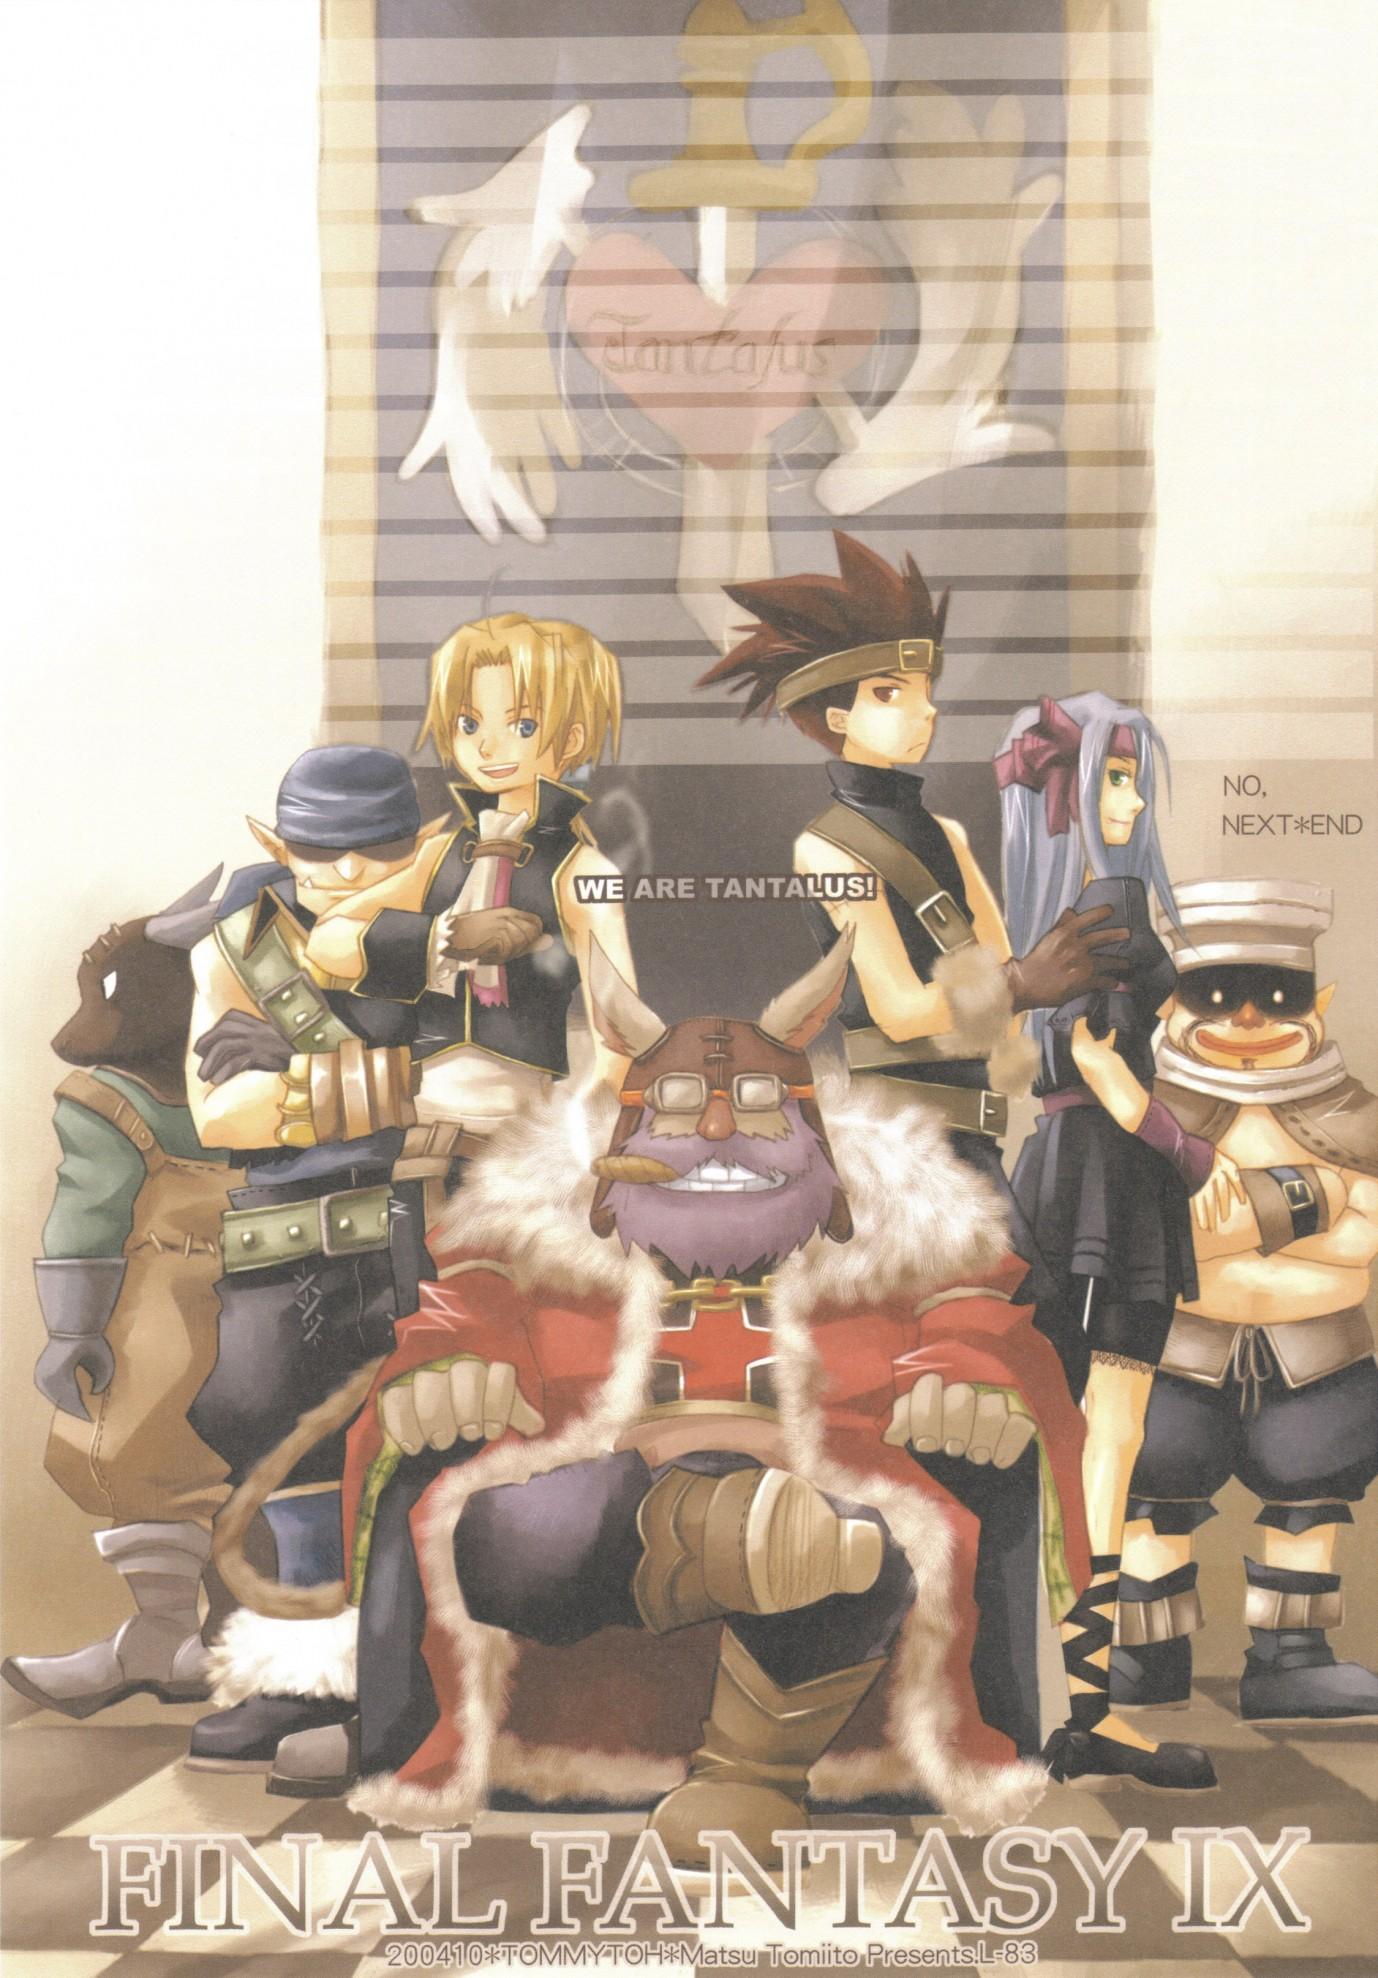 Final fantasy ix image 10651 zerochan anime image board - Final fantasy zidane wallpaper ...